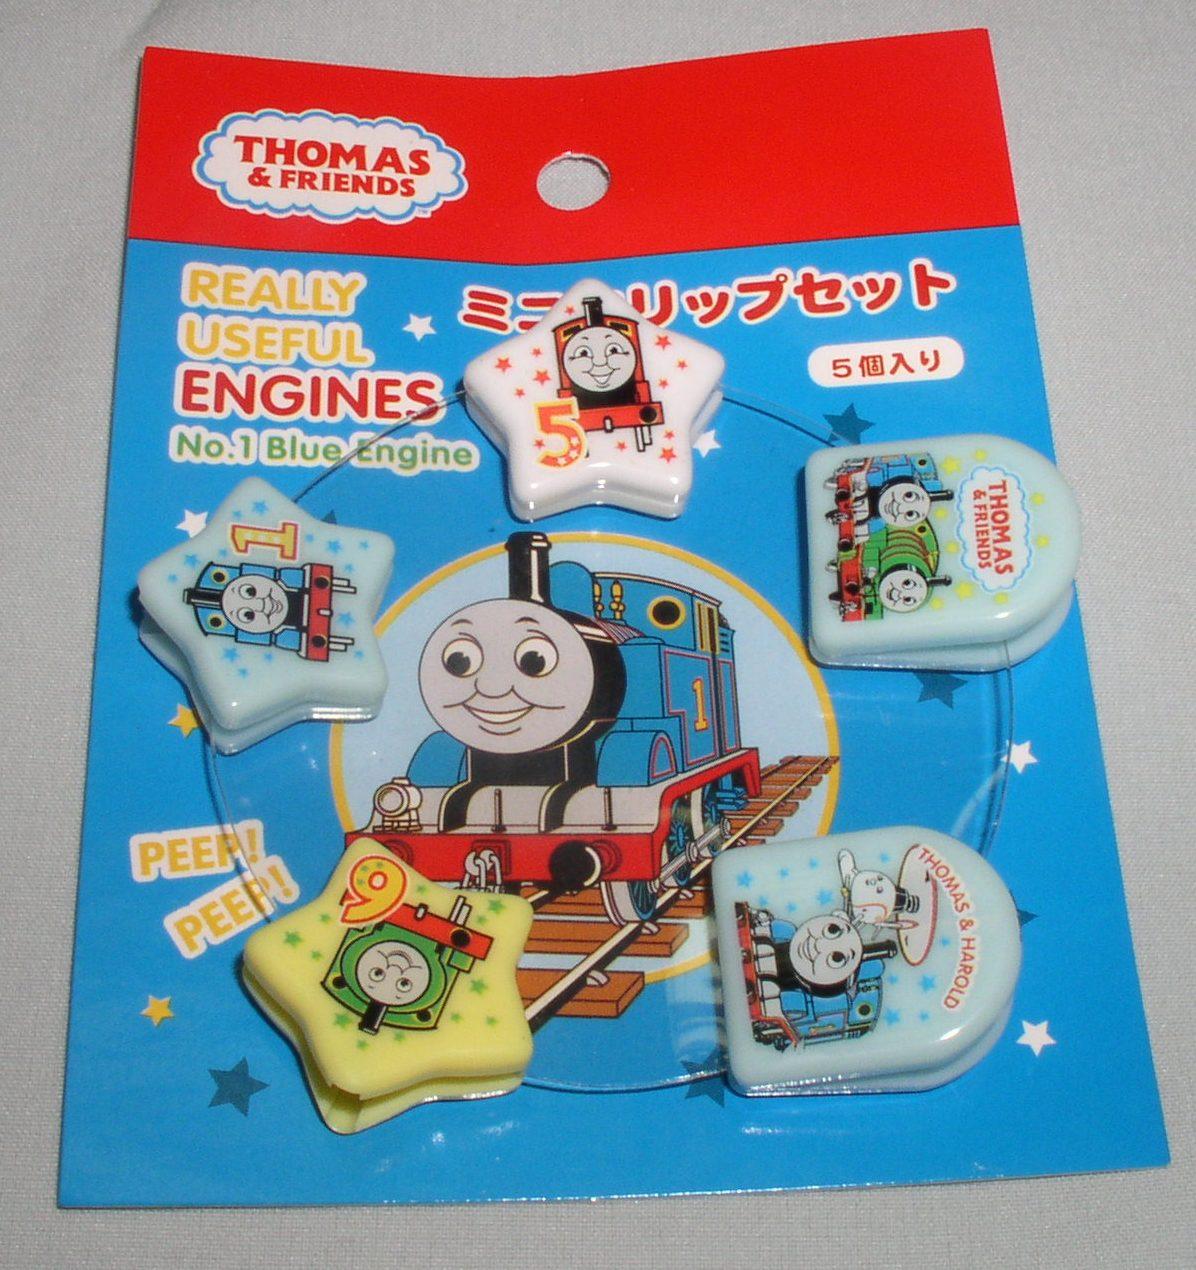 OEM cplastic toys